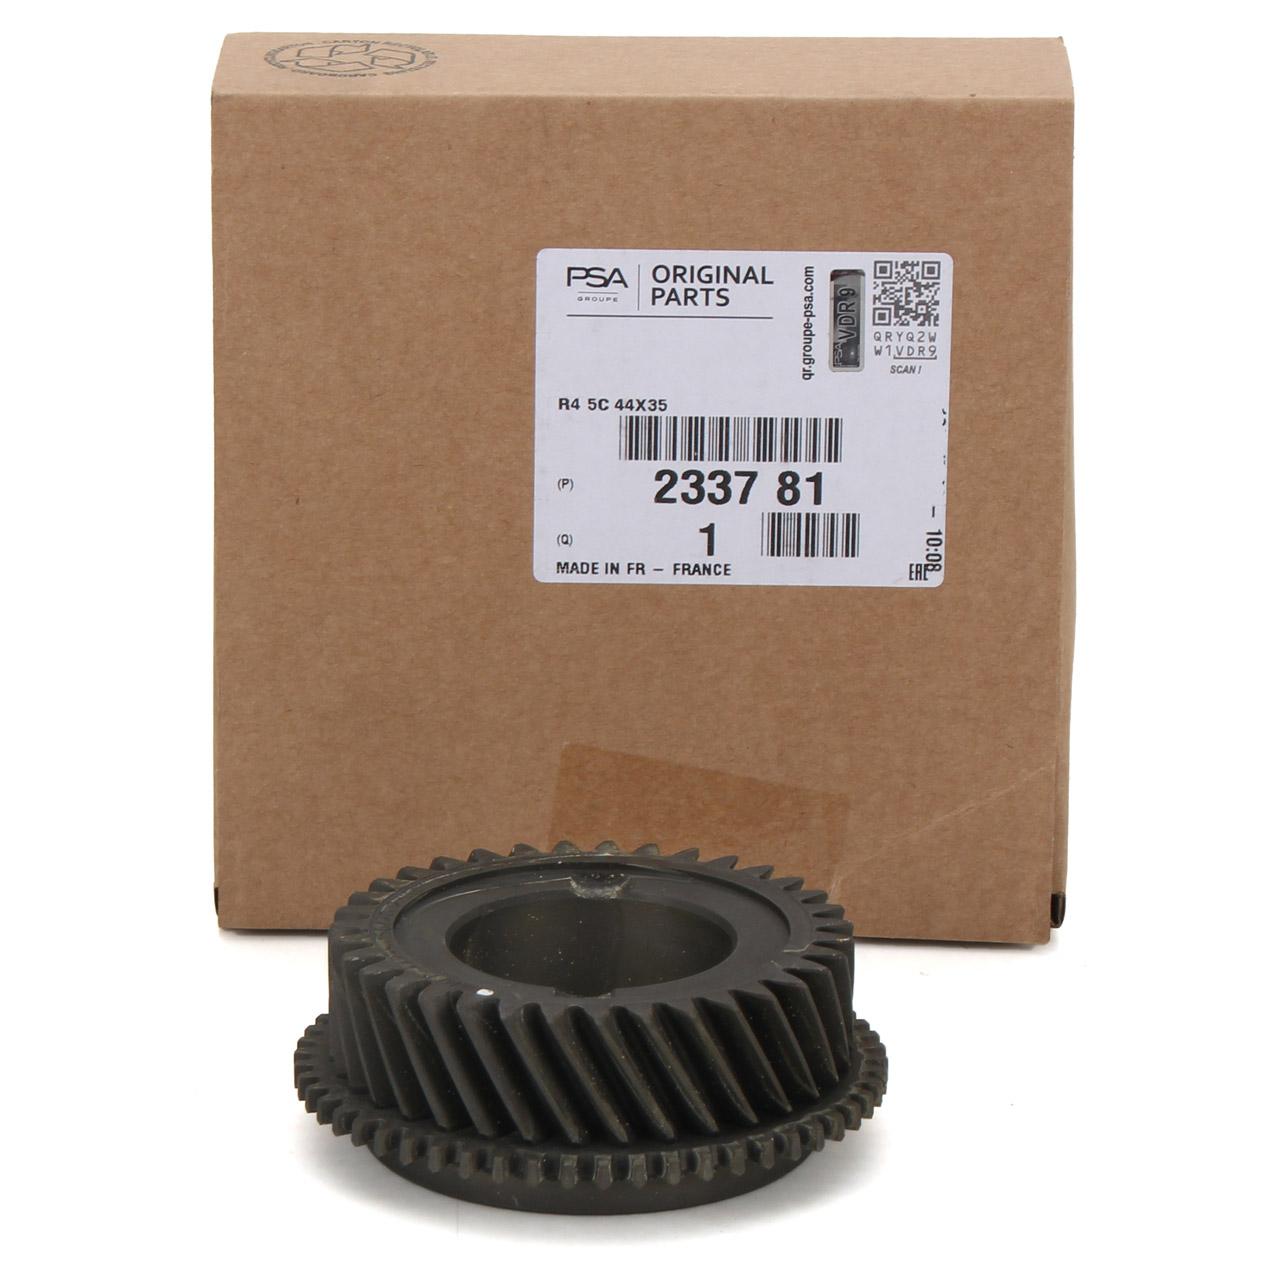 ORIGINAL PSA Zahnrad Getriebeeingangswelle ML6 CL Schaltgetriebe 2337.81